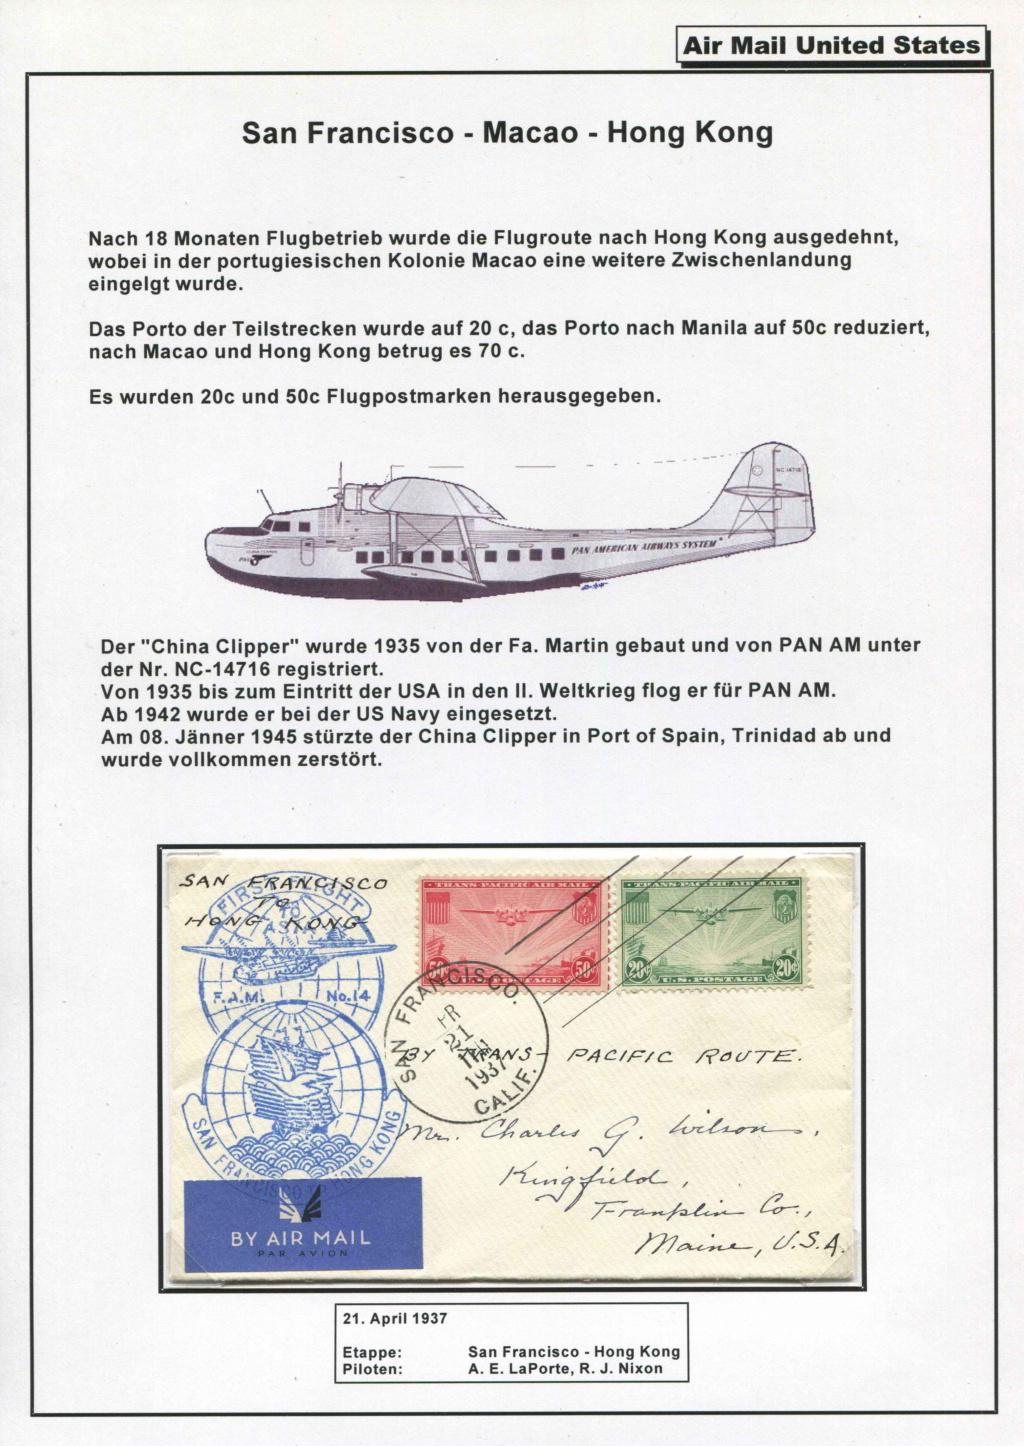 Sammlung FAM 14 (FOREIGN AIR MAIL ROUTE No 14) - Teil 1 Fam_1433